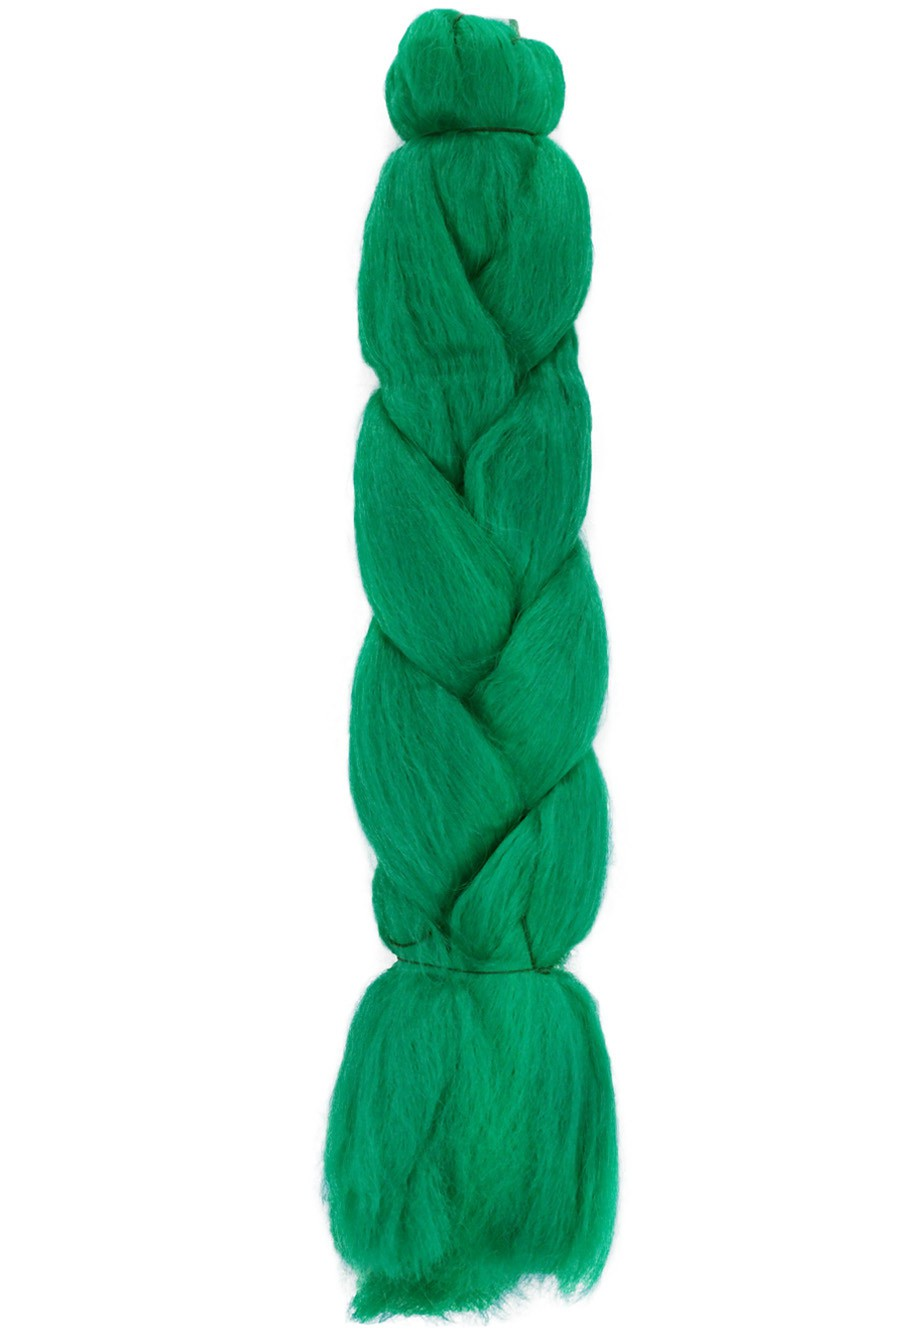 Cabelo Sintético - Ser Mulher - Jumbo (399g) - Cor: Verde Escuro (Dark Green)